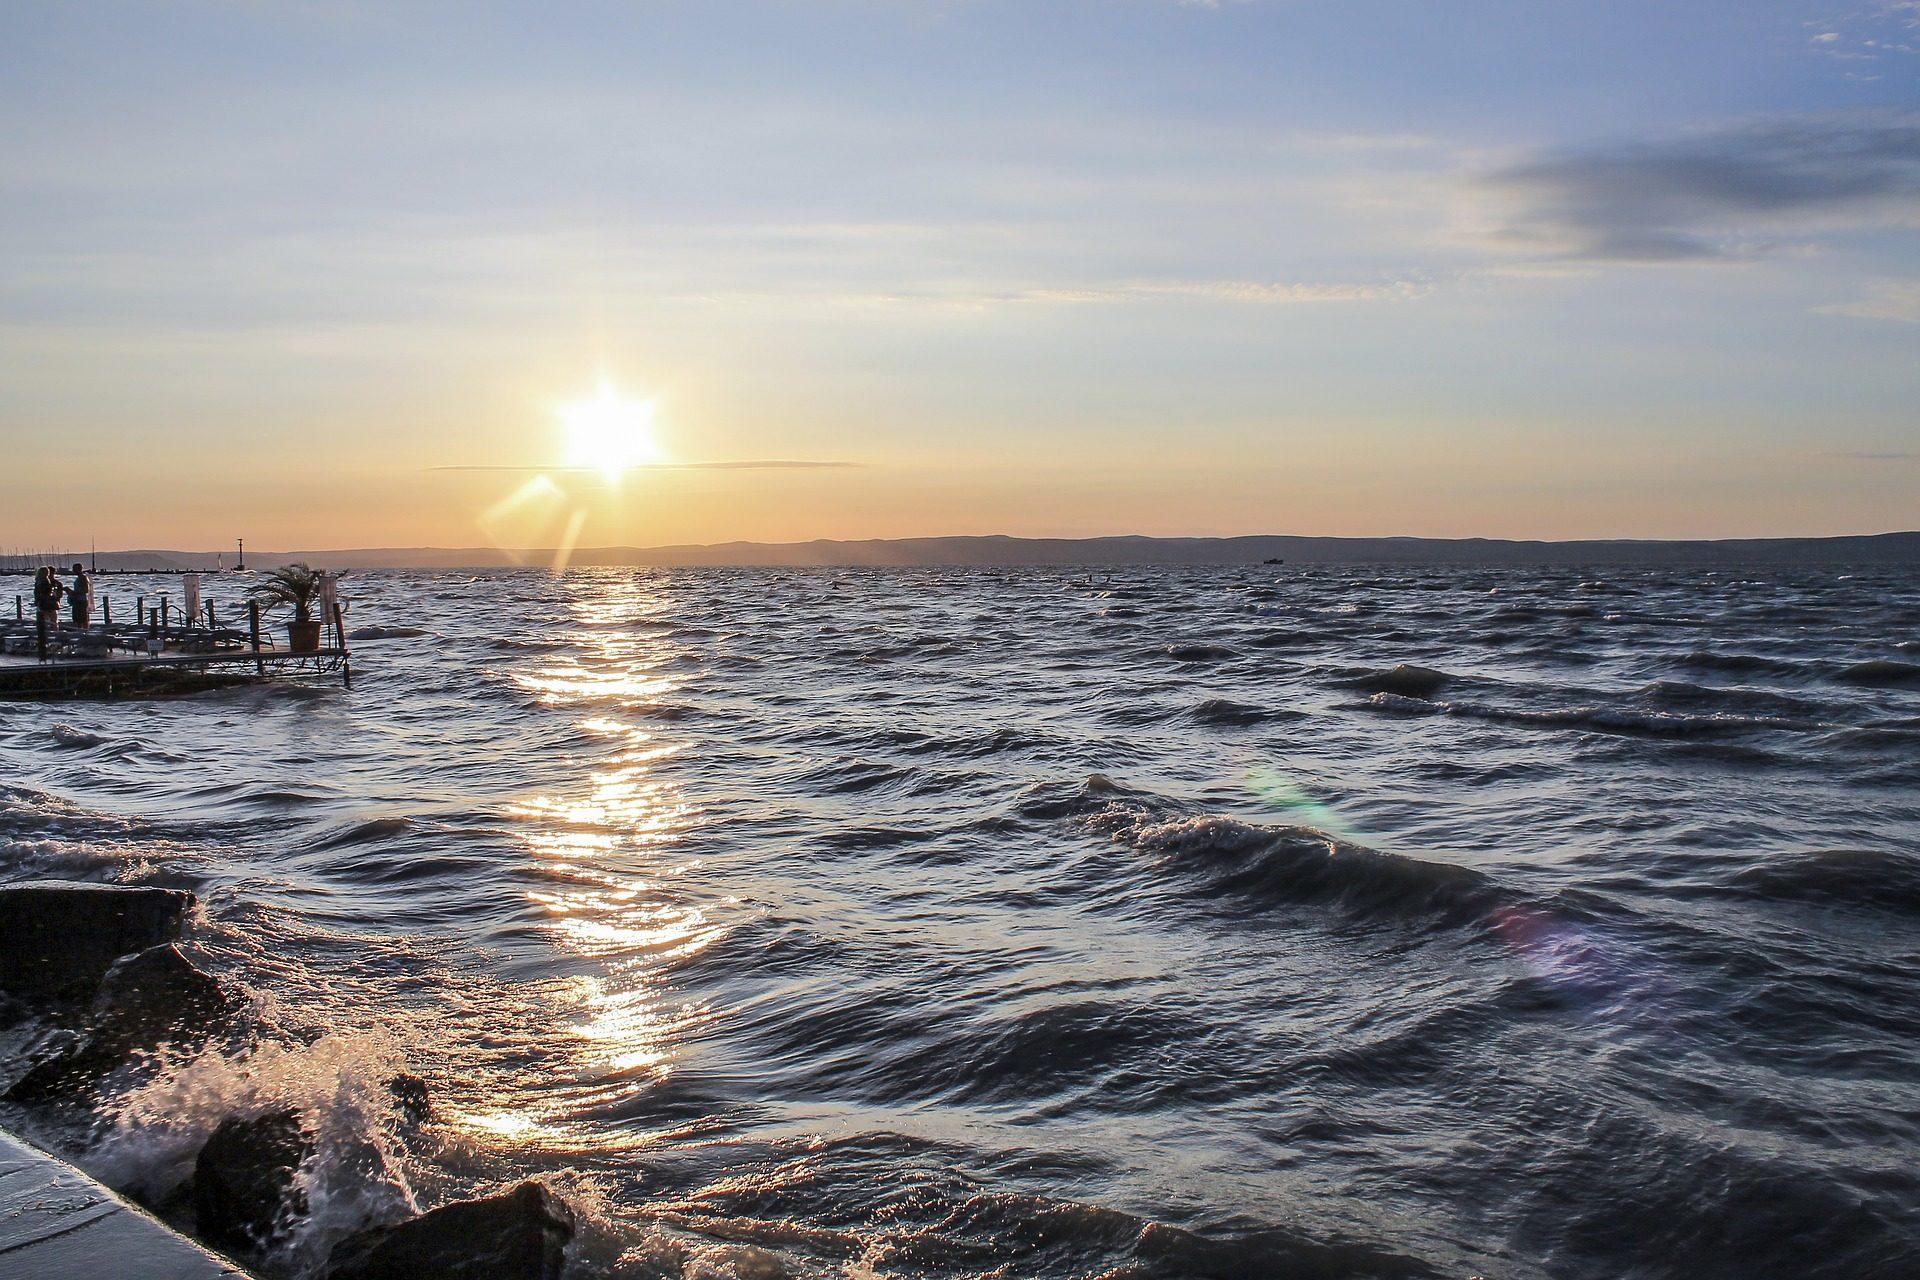 Lago, Balaton, Pôr do sol, Relaxe, Hungria - Papéis de parede HD - Professor-falken.com